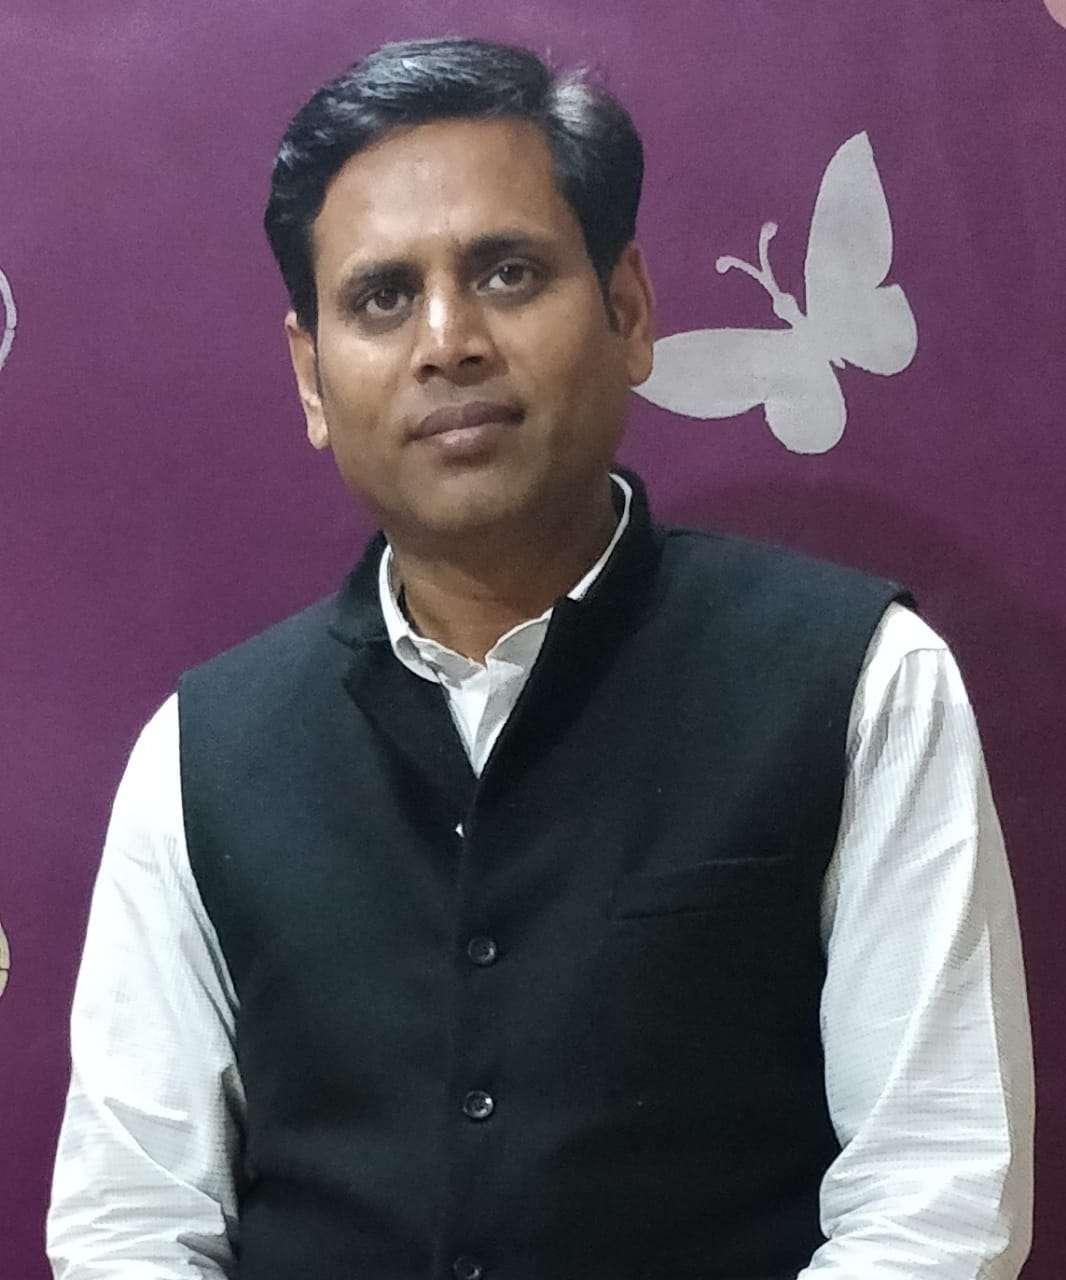 Aap leader Vineet Sharma